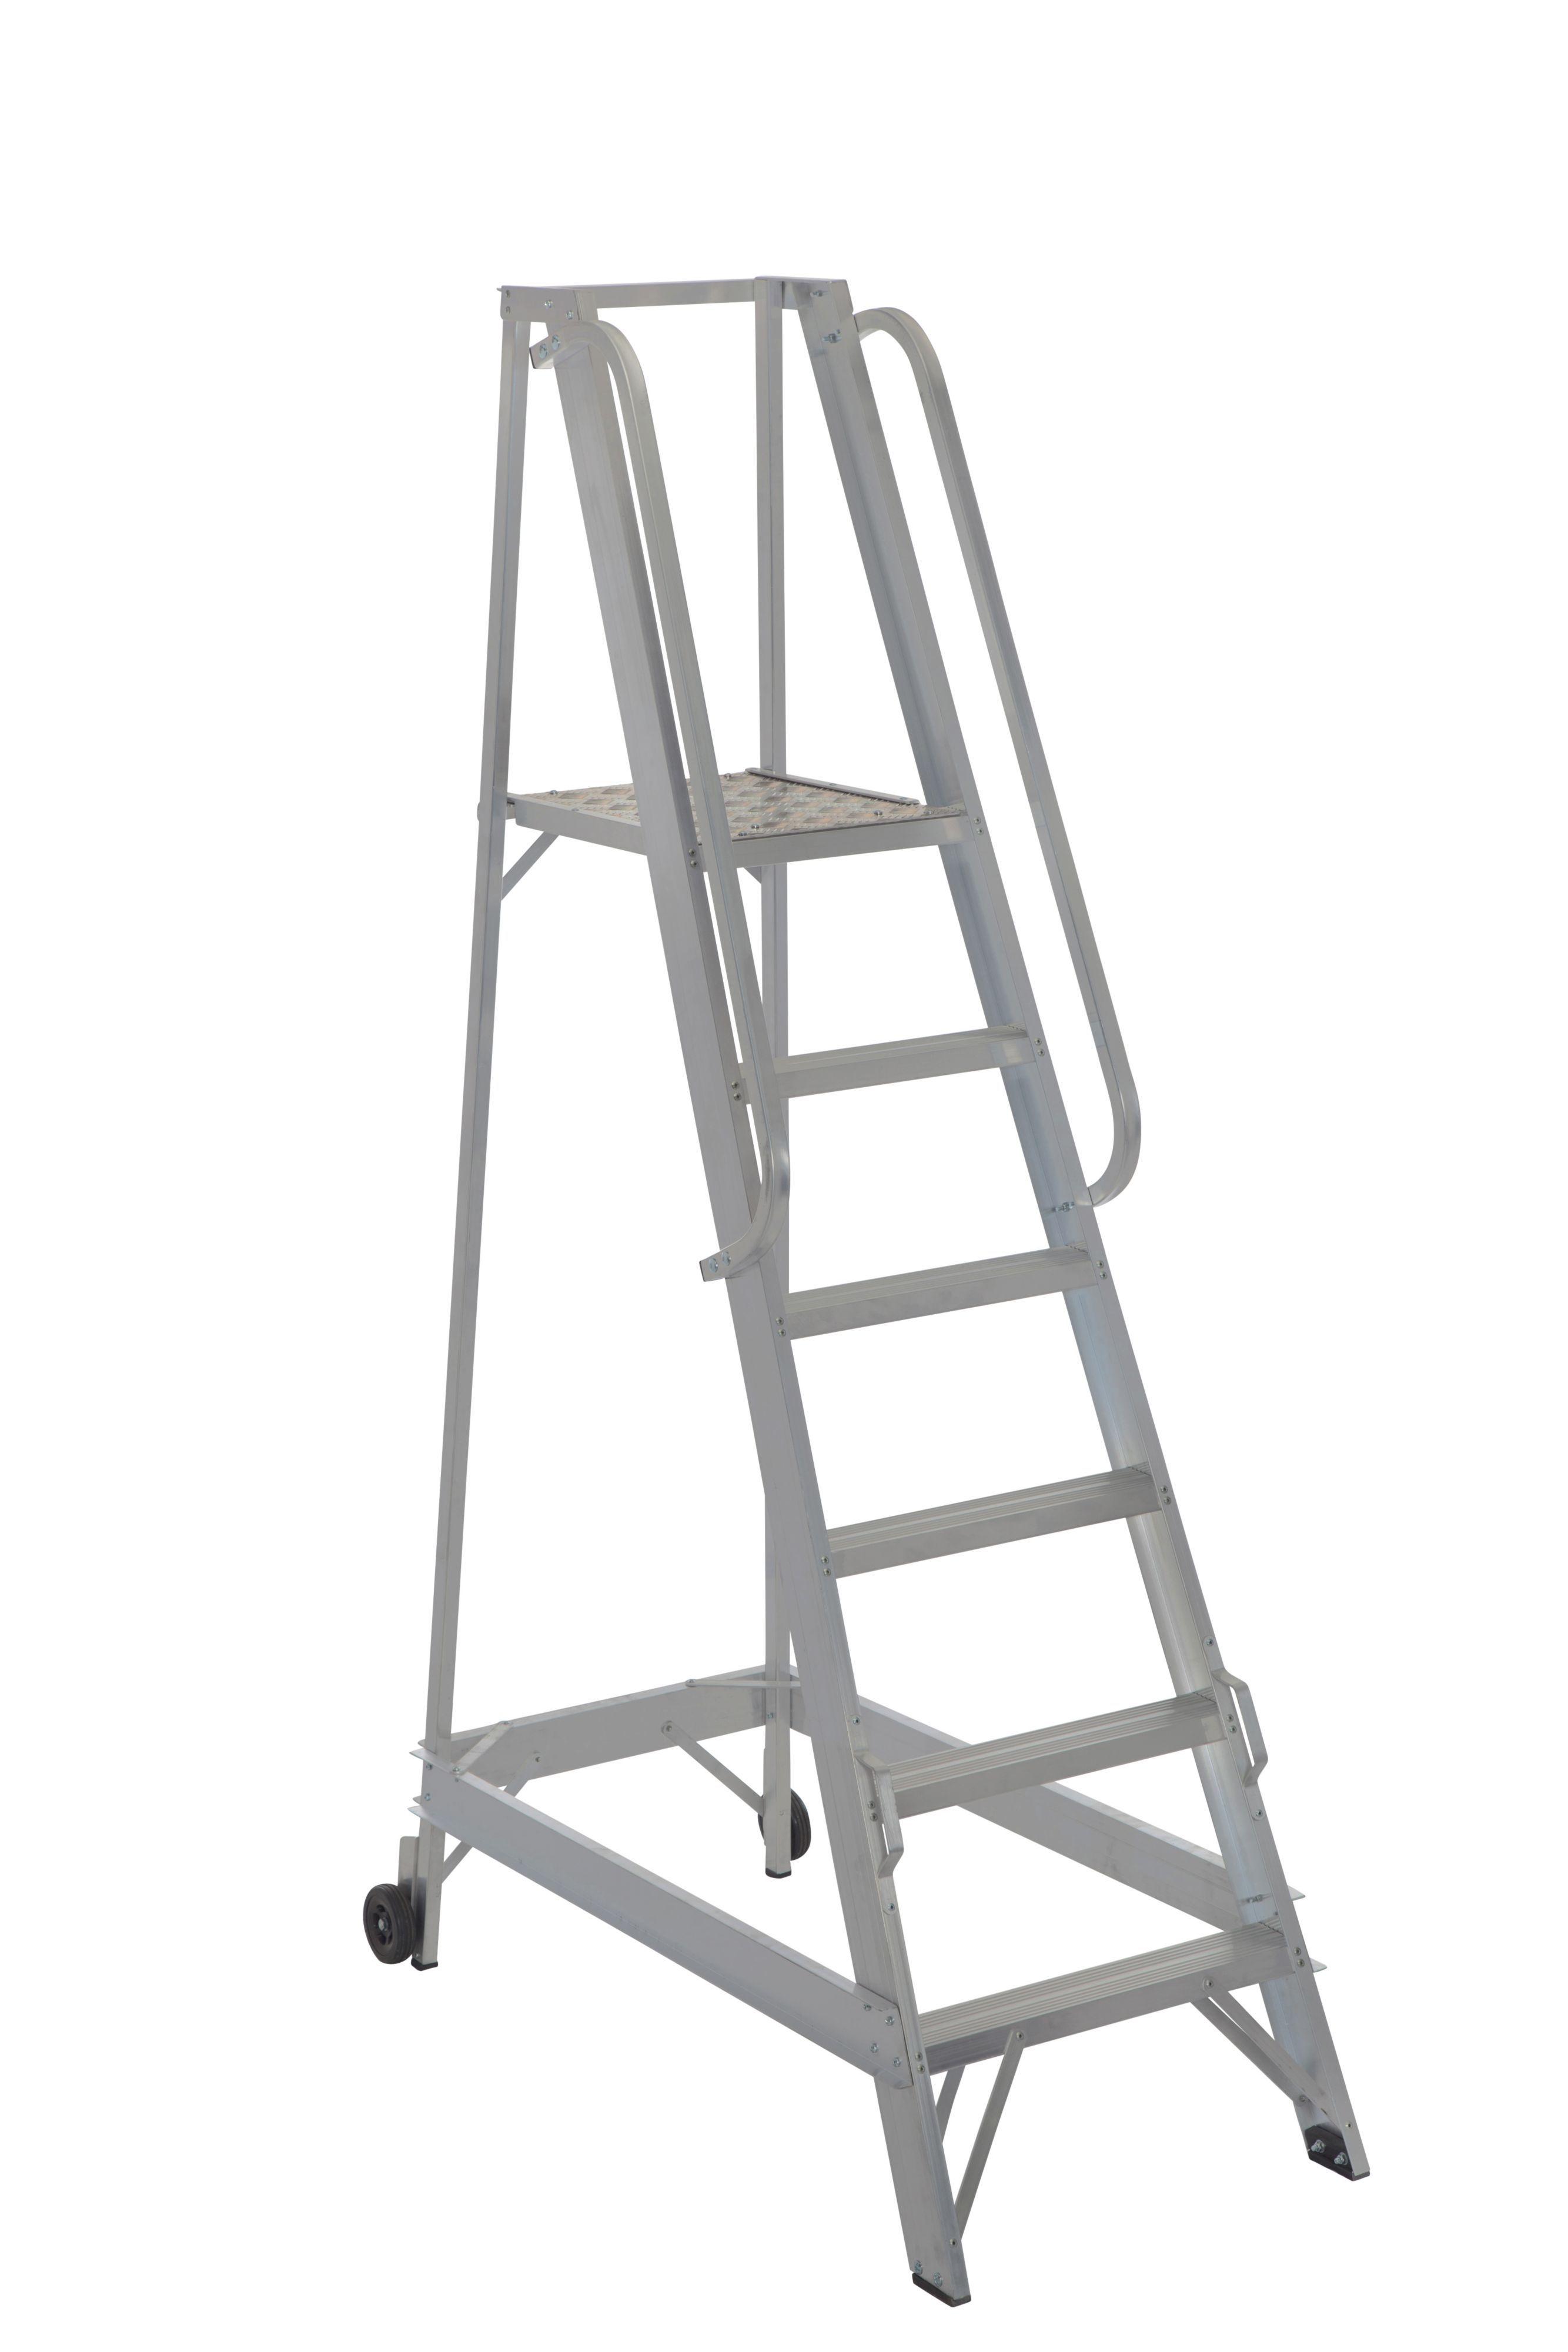 Werner 6 Tread Aluminium Platform Stepladder, 2 M